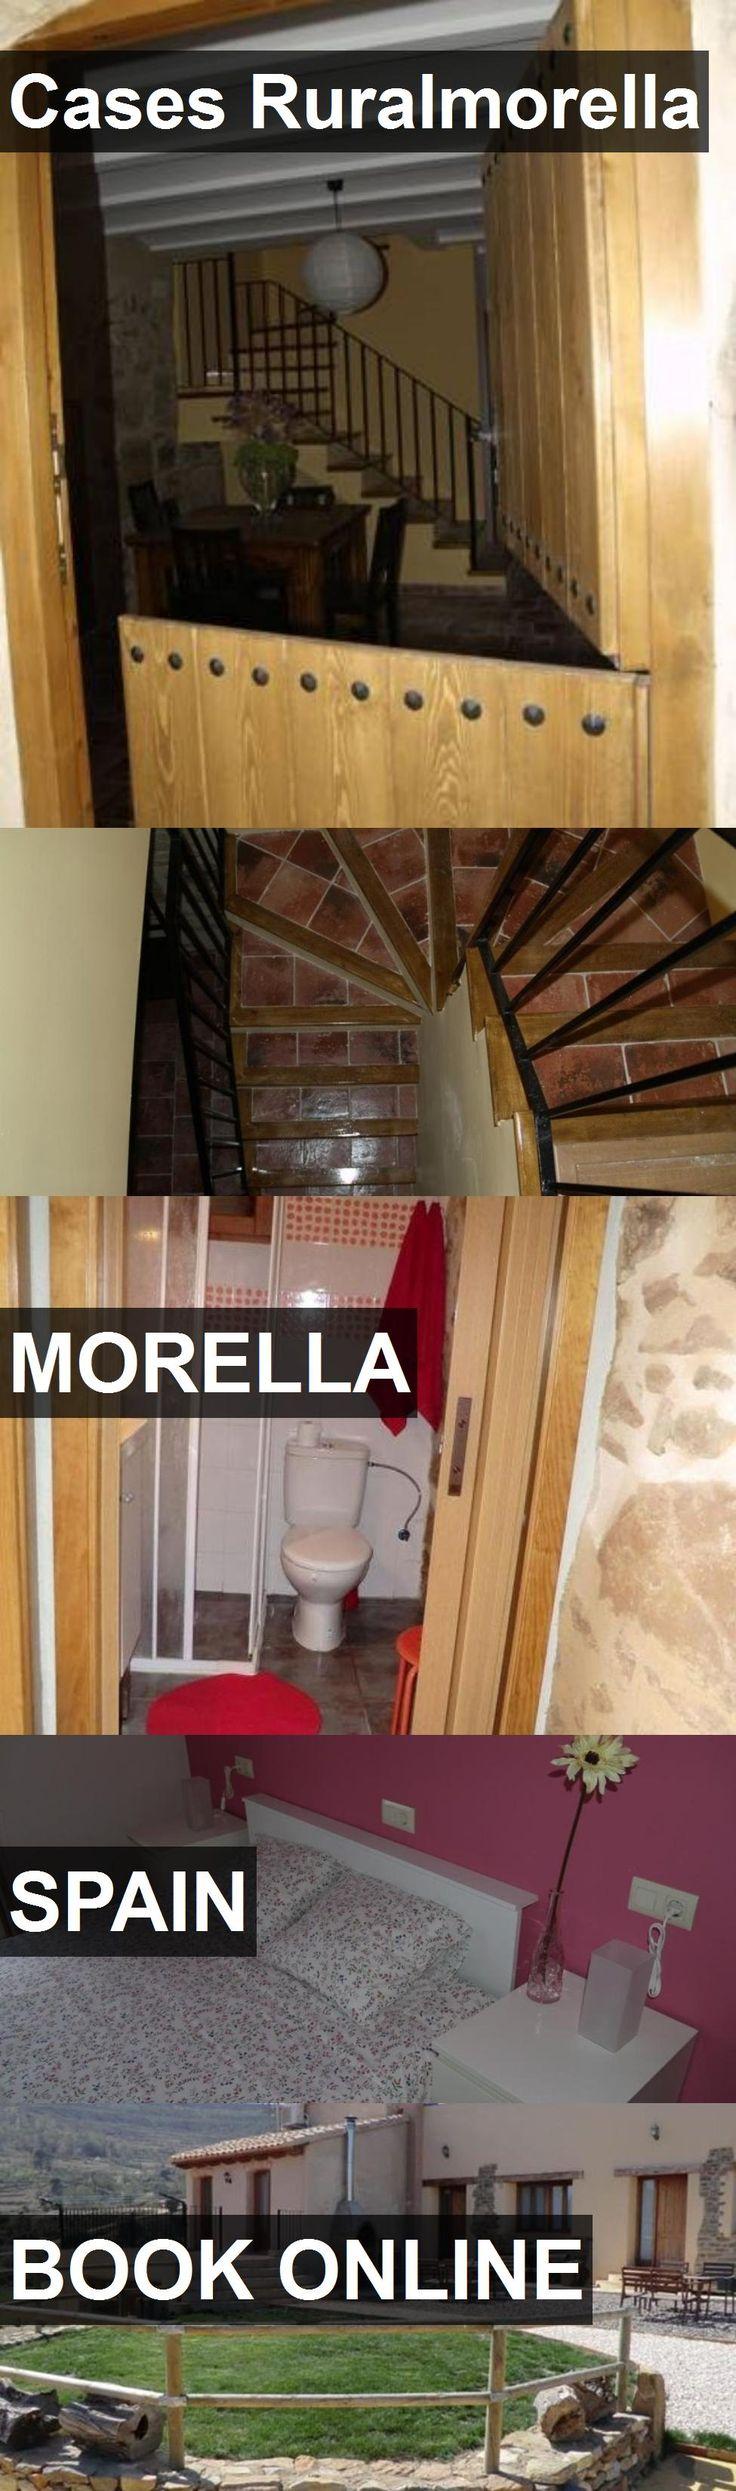 Hotel Cases Ruralmorella in Morella, Spain. For more information, photos, reviews and best prices please follow the link. #Spain #Morella #CasesRuralmorella #hotel #travel #vacation